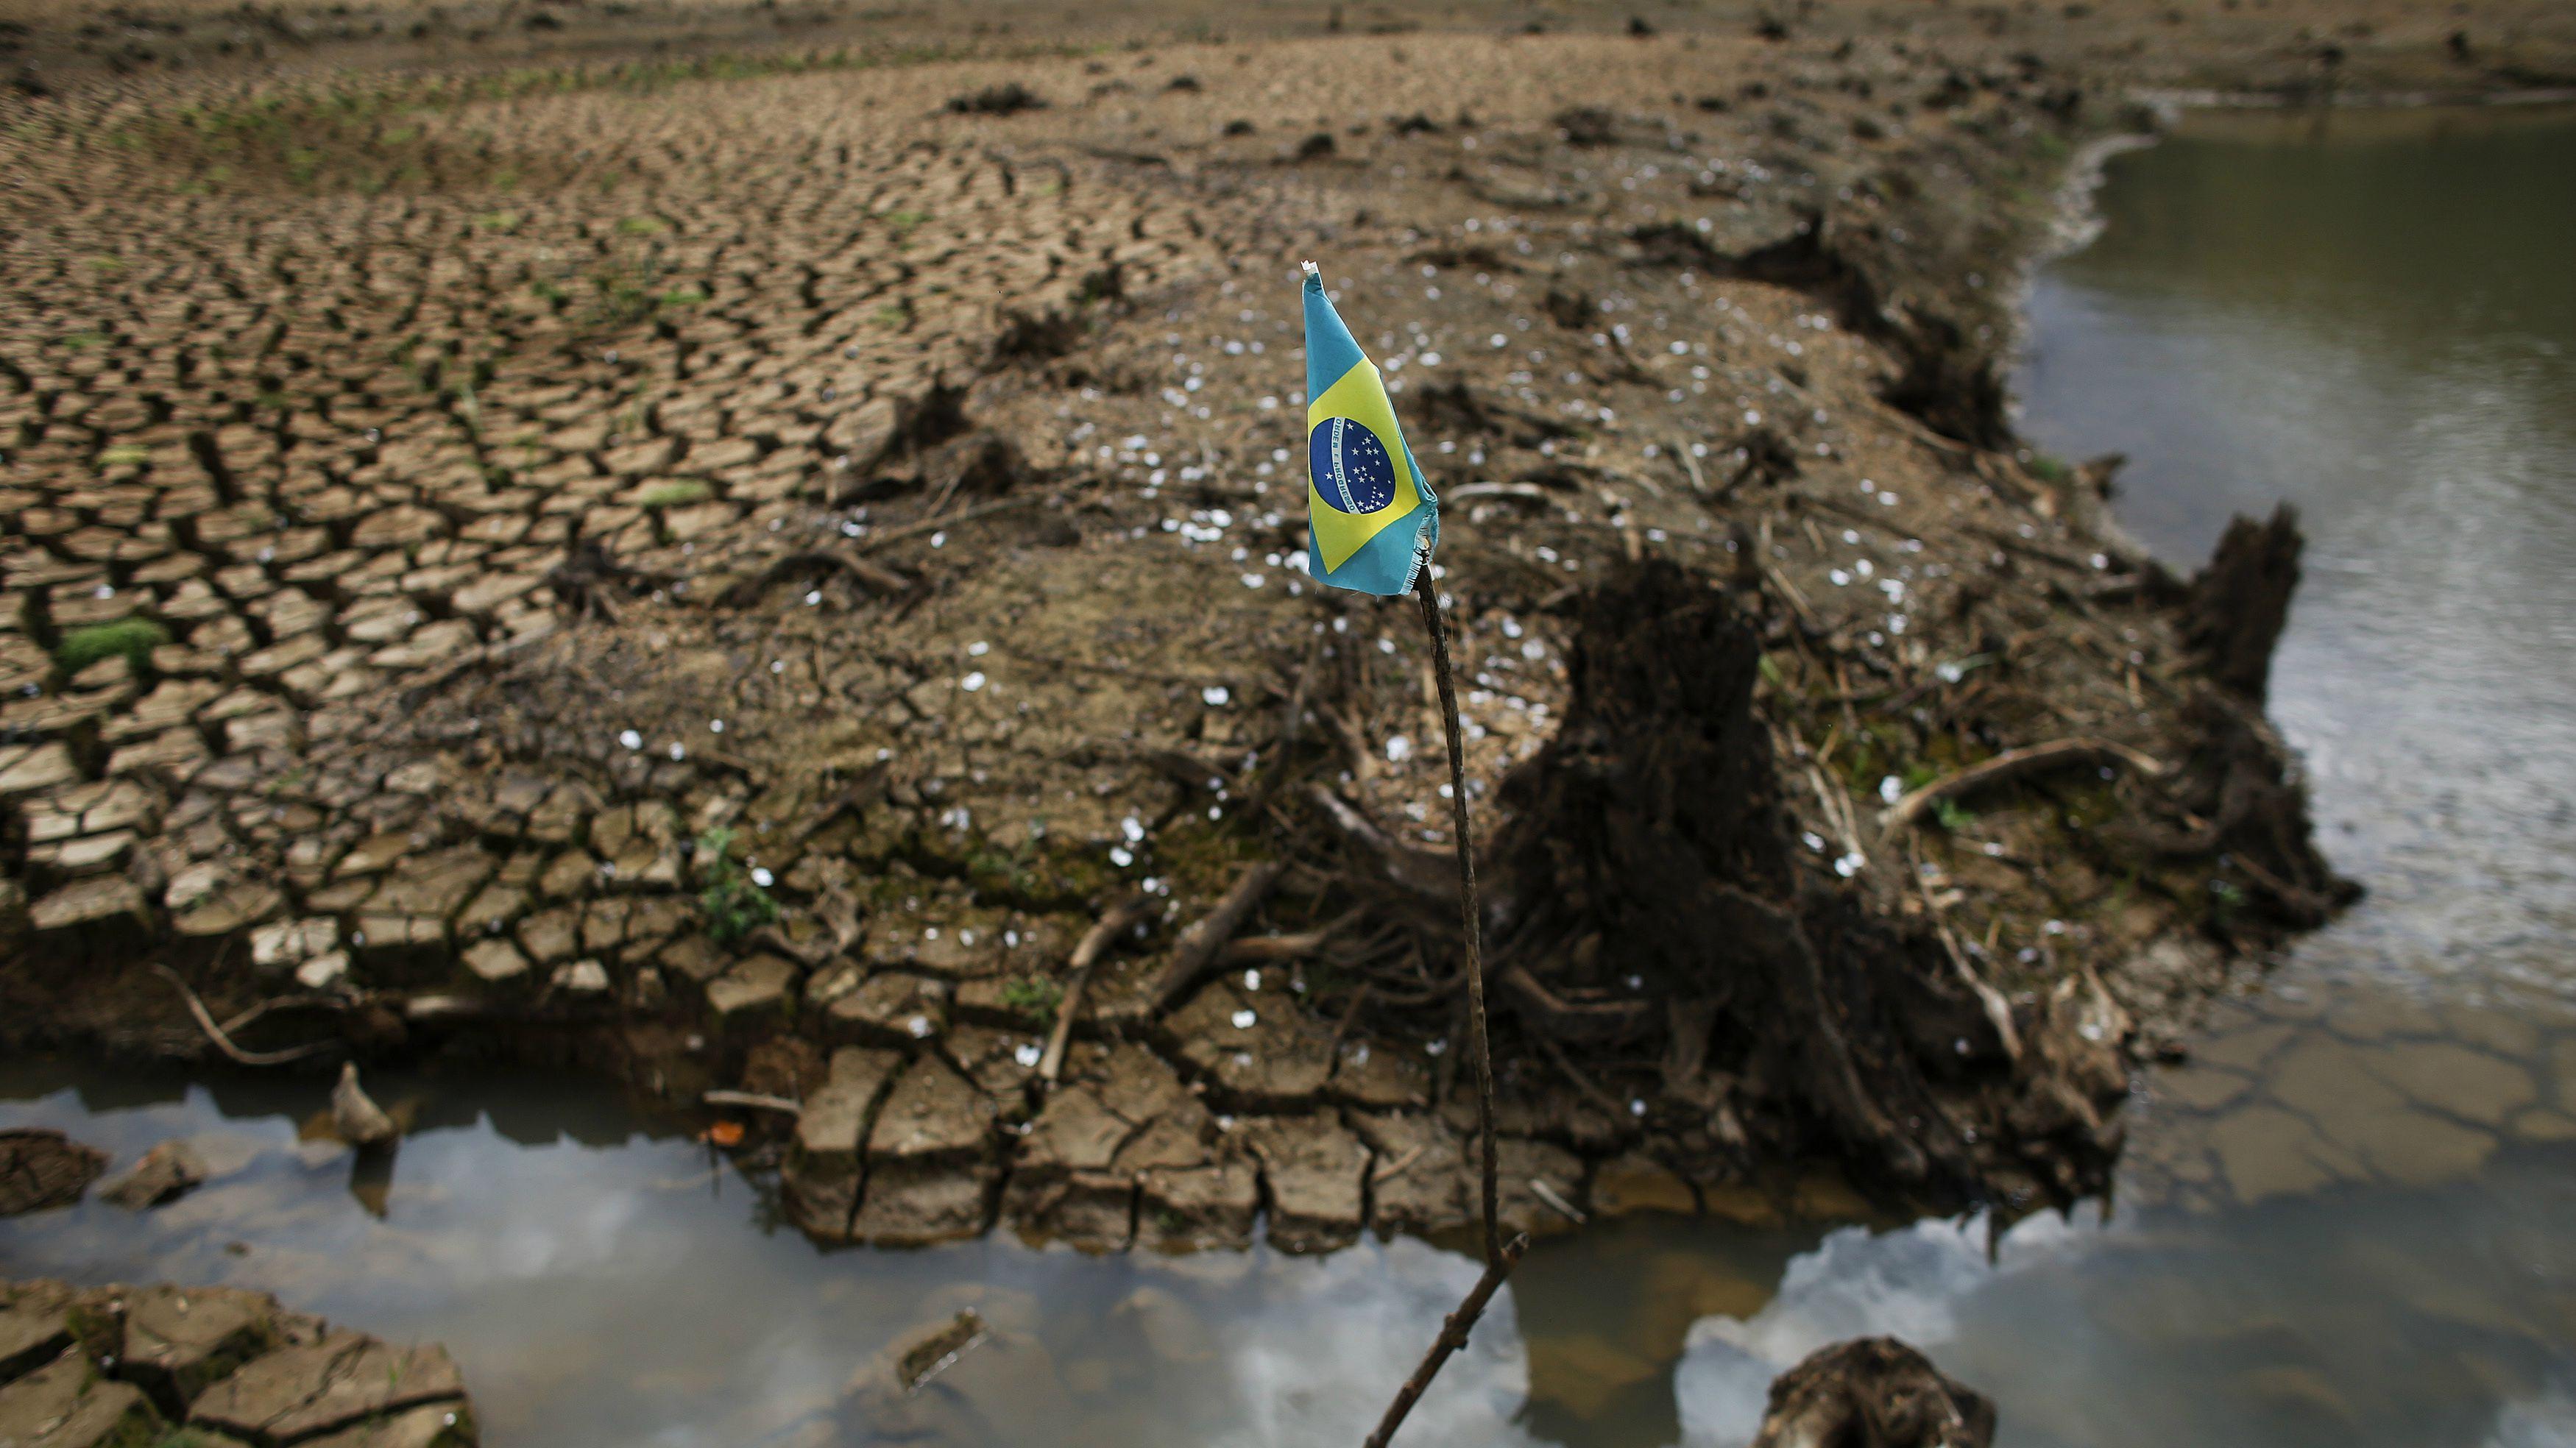 Sao Paulo water shortage, Atibainha dam, part of the Cantareira reservoir